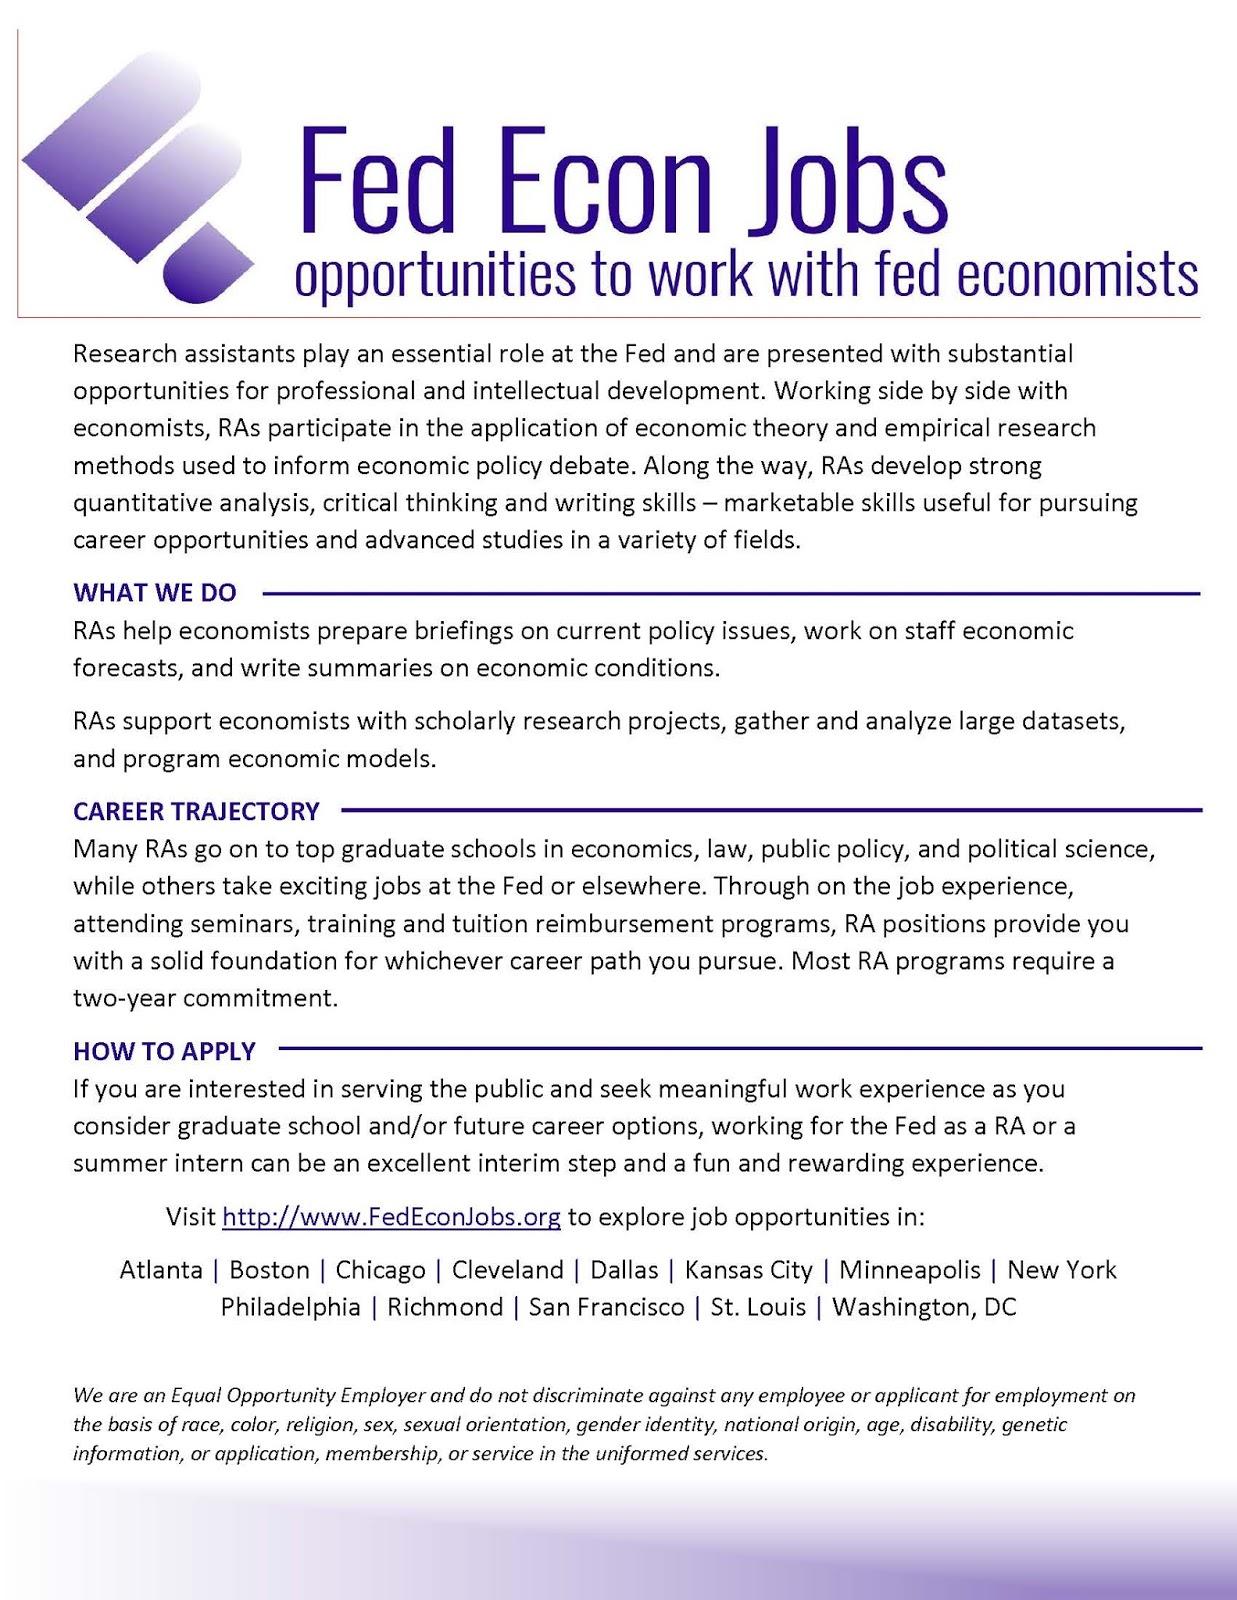 ECON Undergraduate Blog: Federal Reserve System - Job